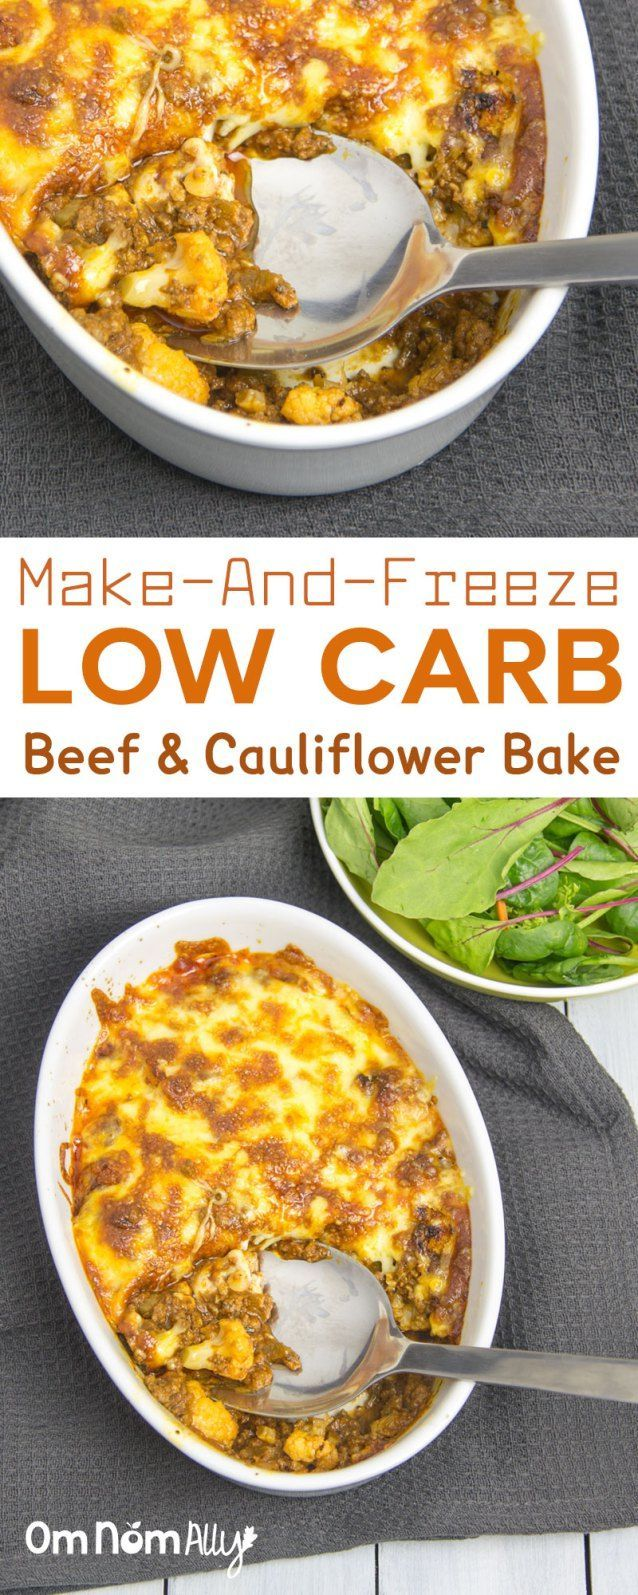 Low Carb Beef & Cauliflower Pasta Bake   Om Nom Ally